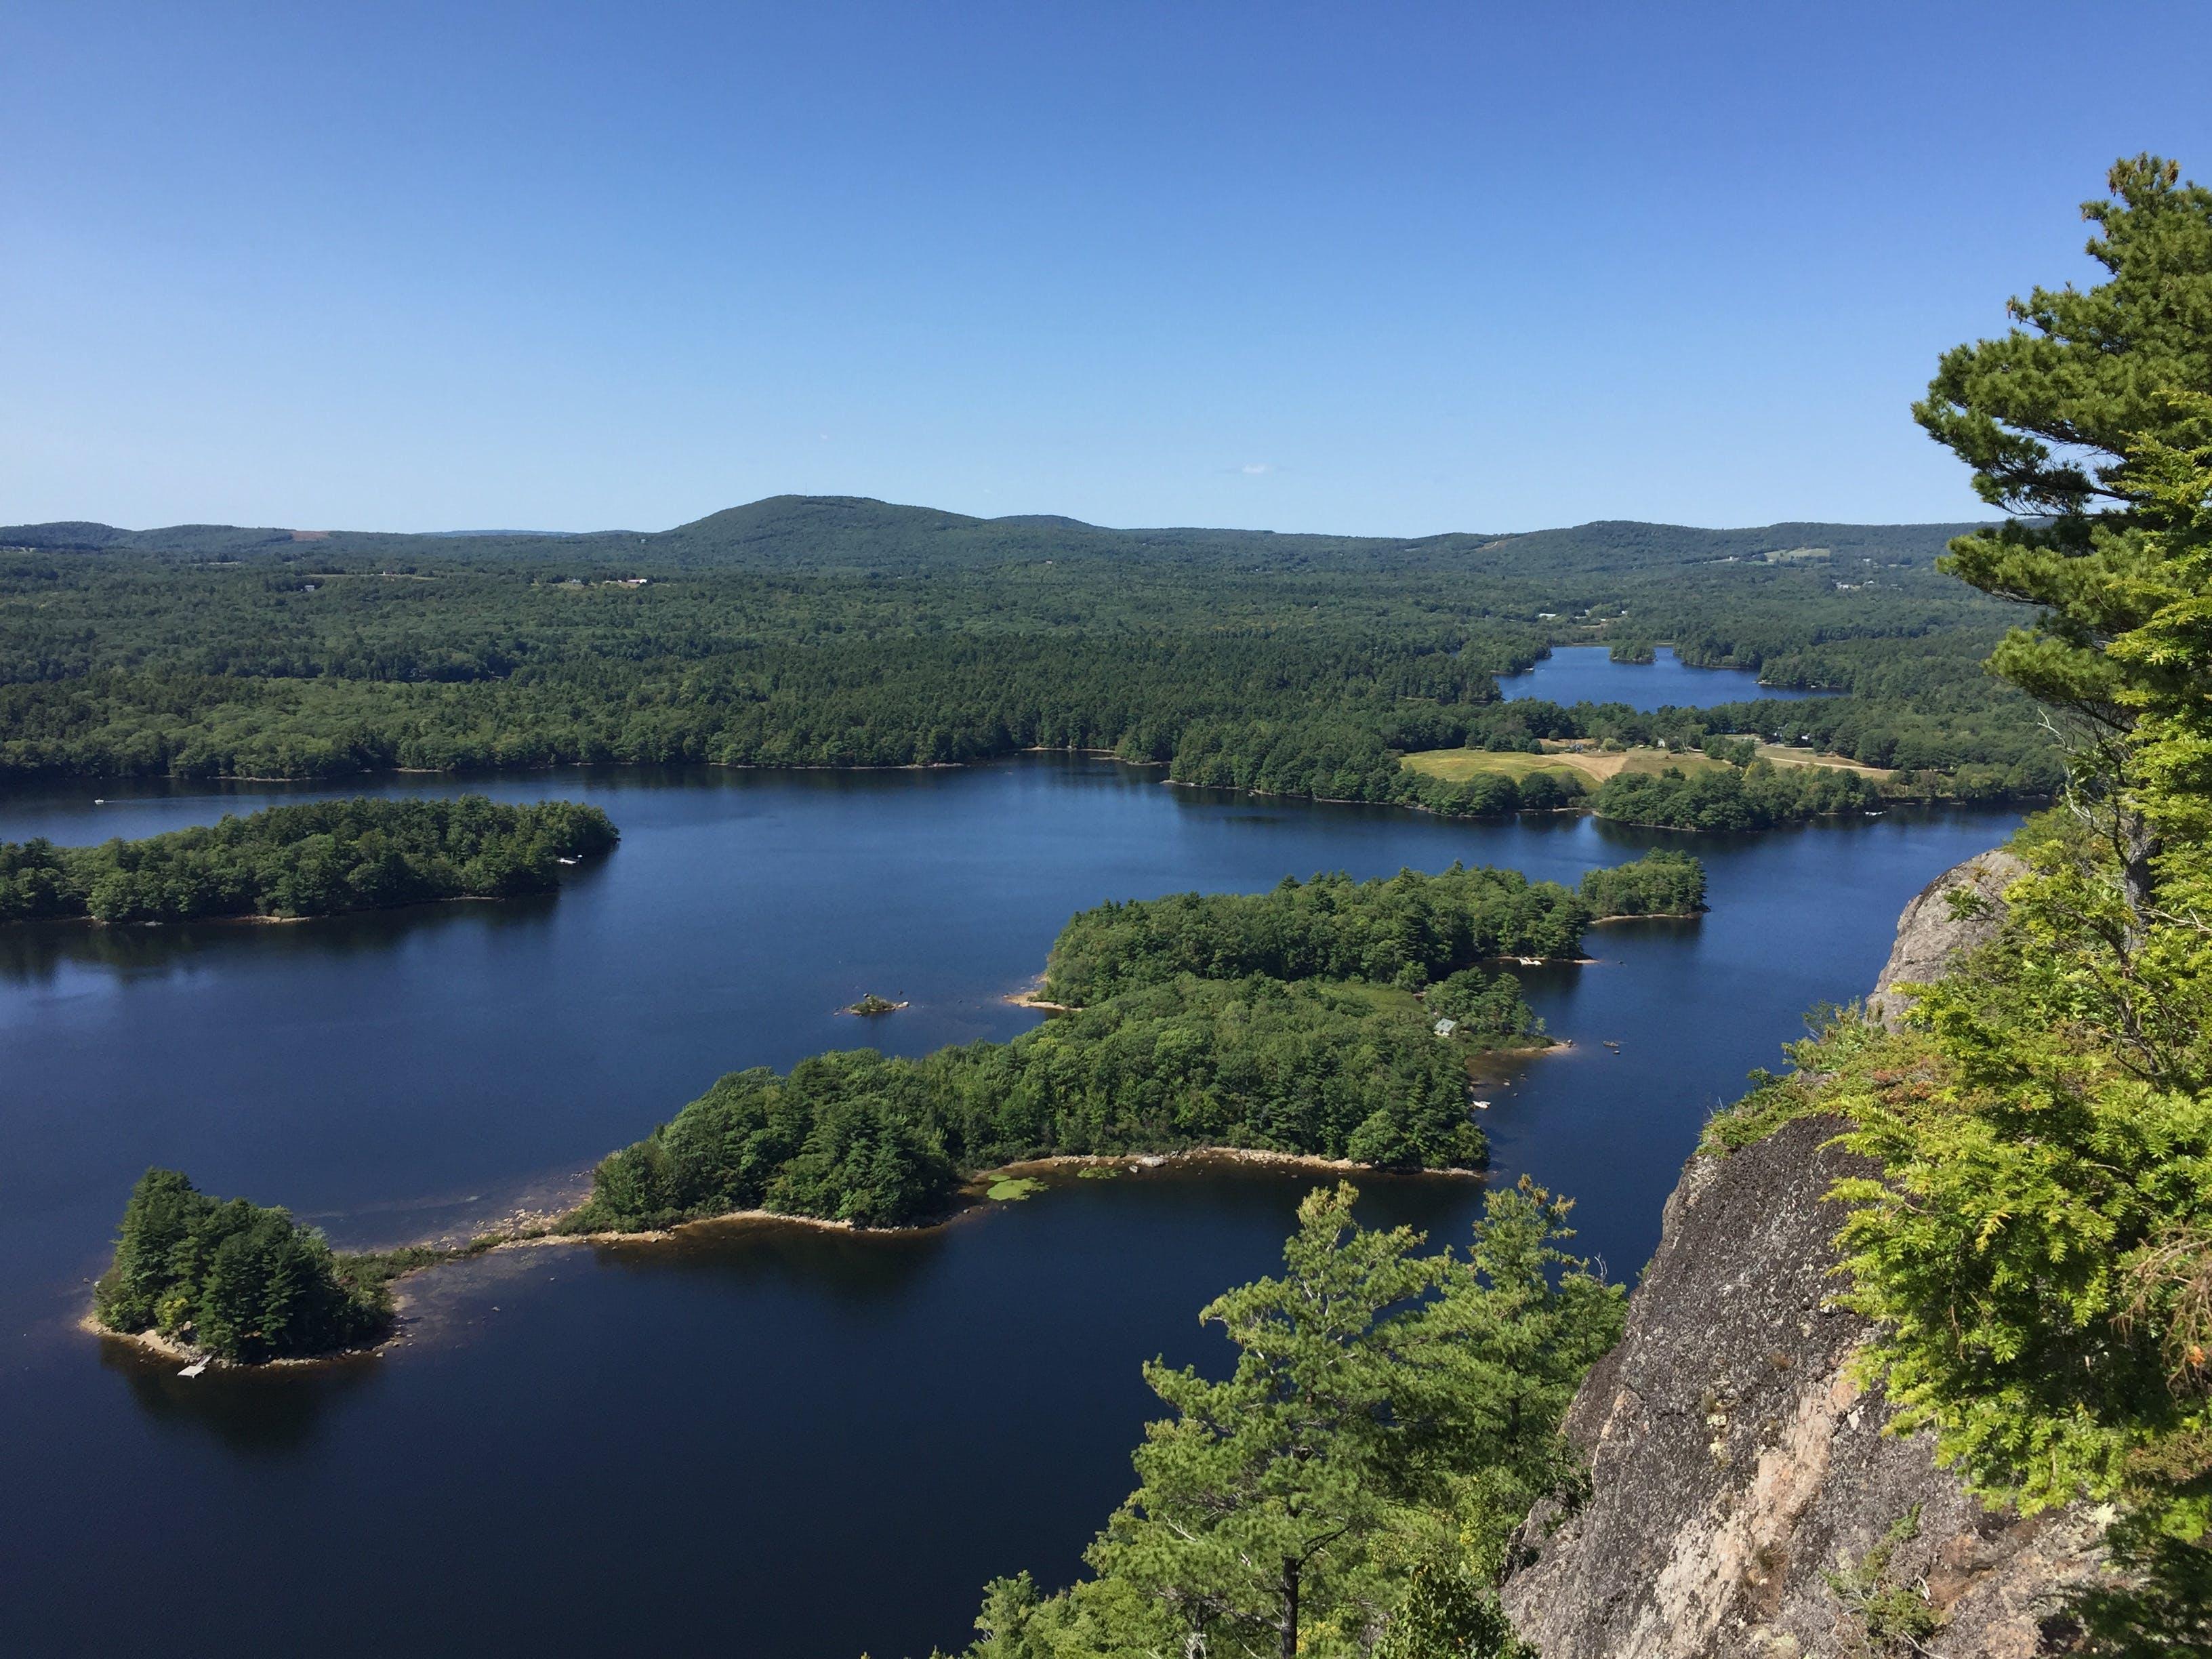 Free stock photo of nature, mountain, cliff, vista